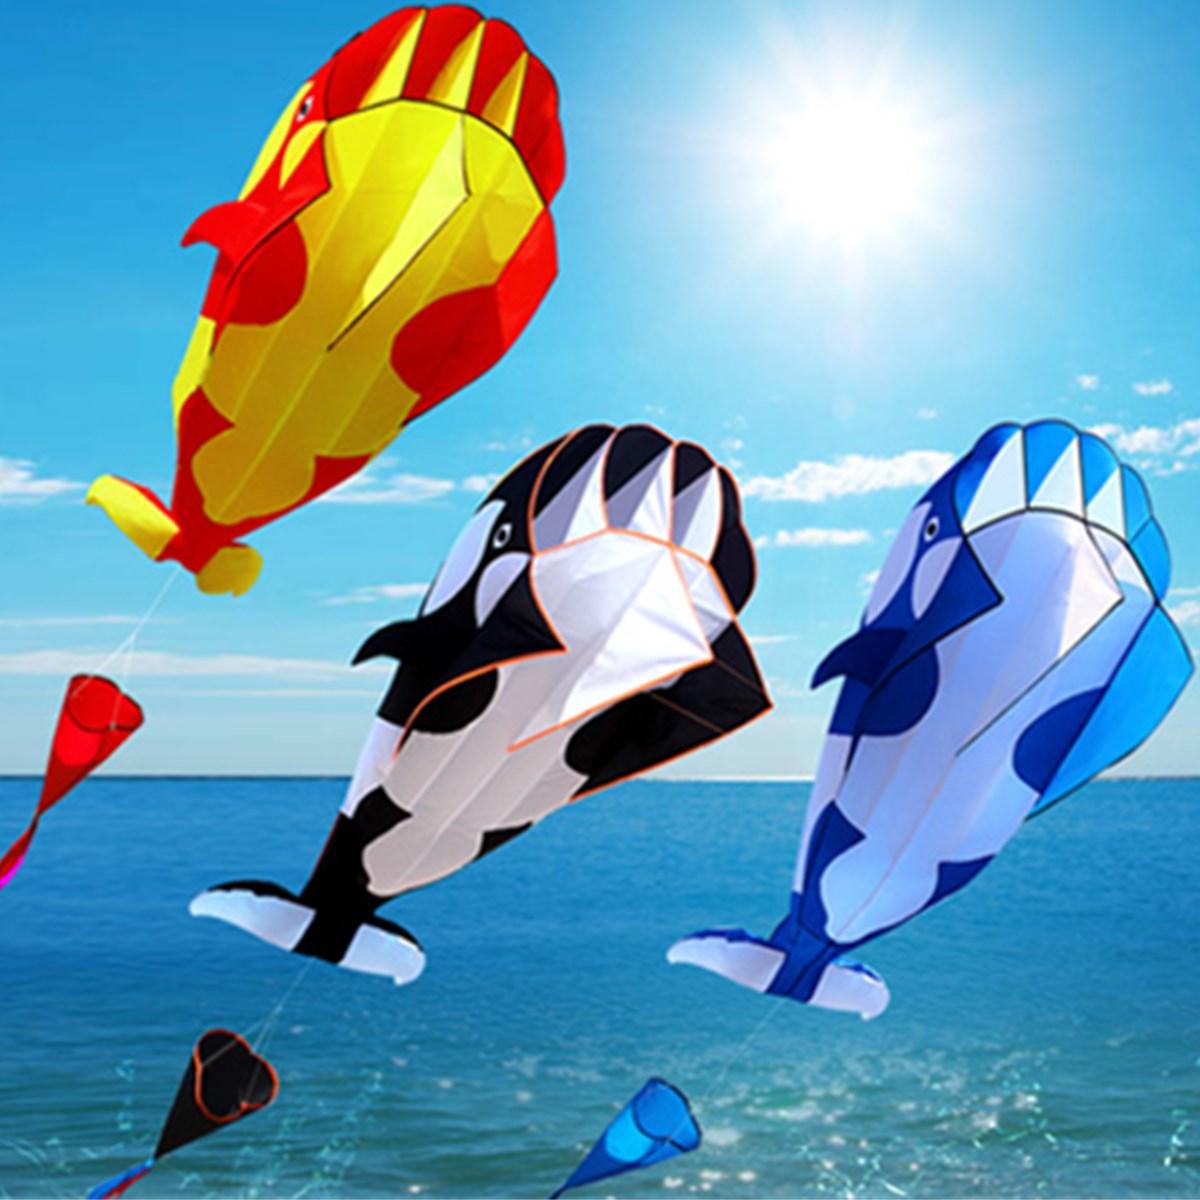 3D Cartoon Whale Kite For Children Software Kite Kids Girls Cute Animal Kites Single Line Parafoil Giant Whale Flying Kite Toys все цены